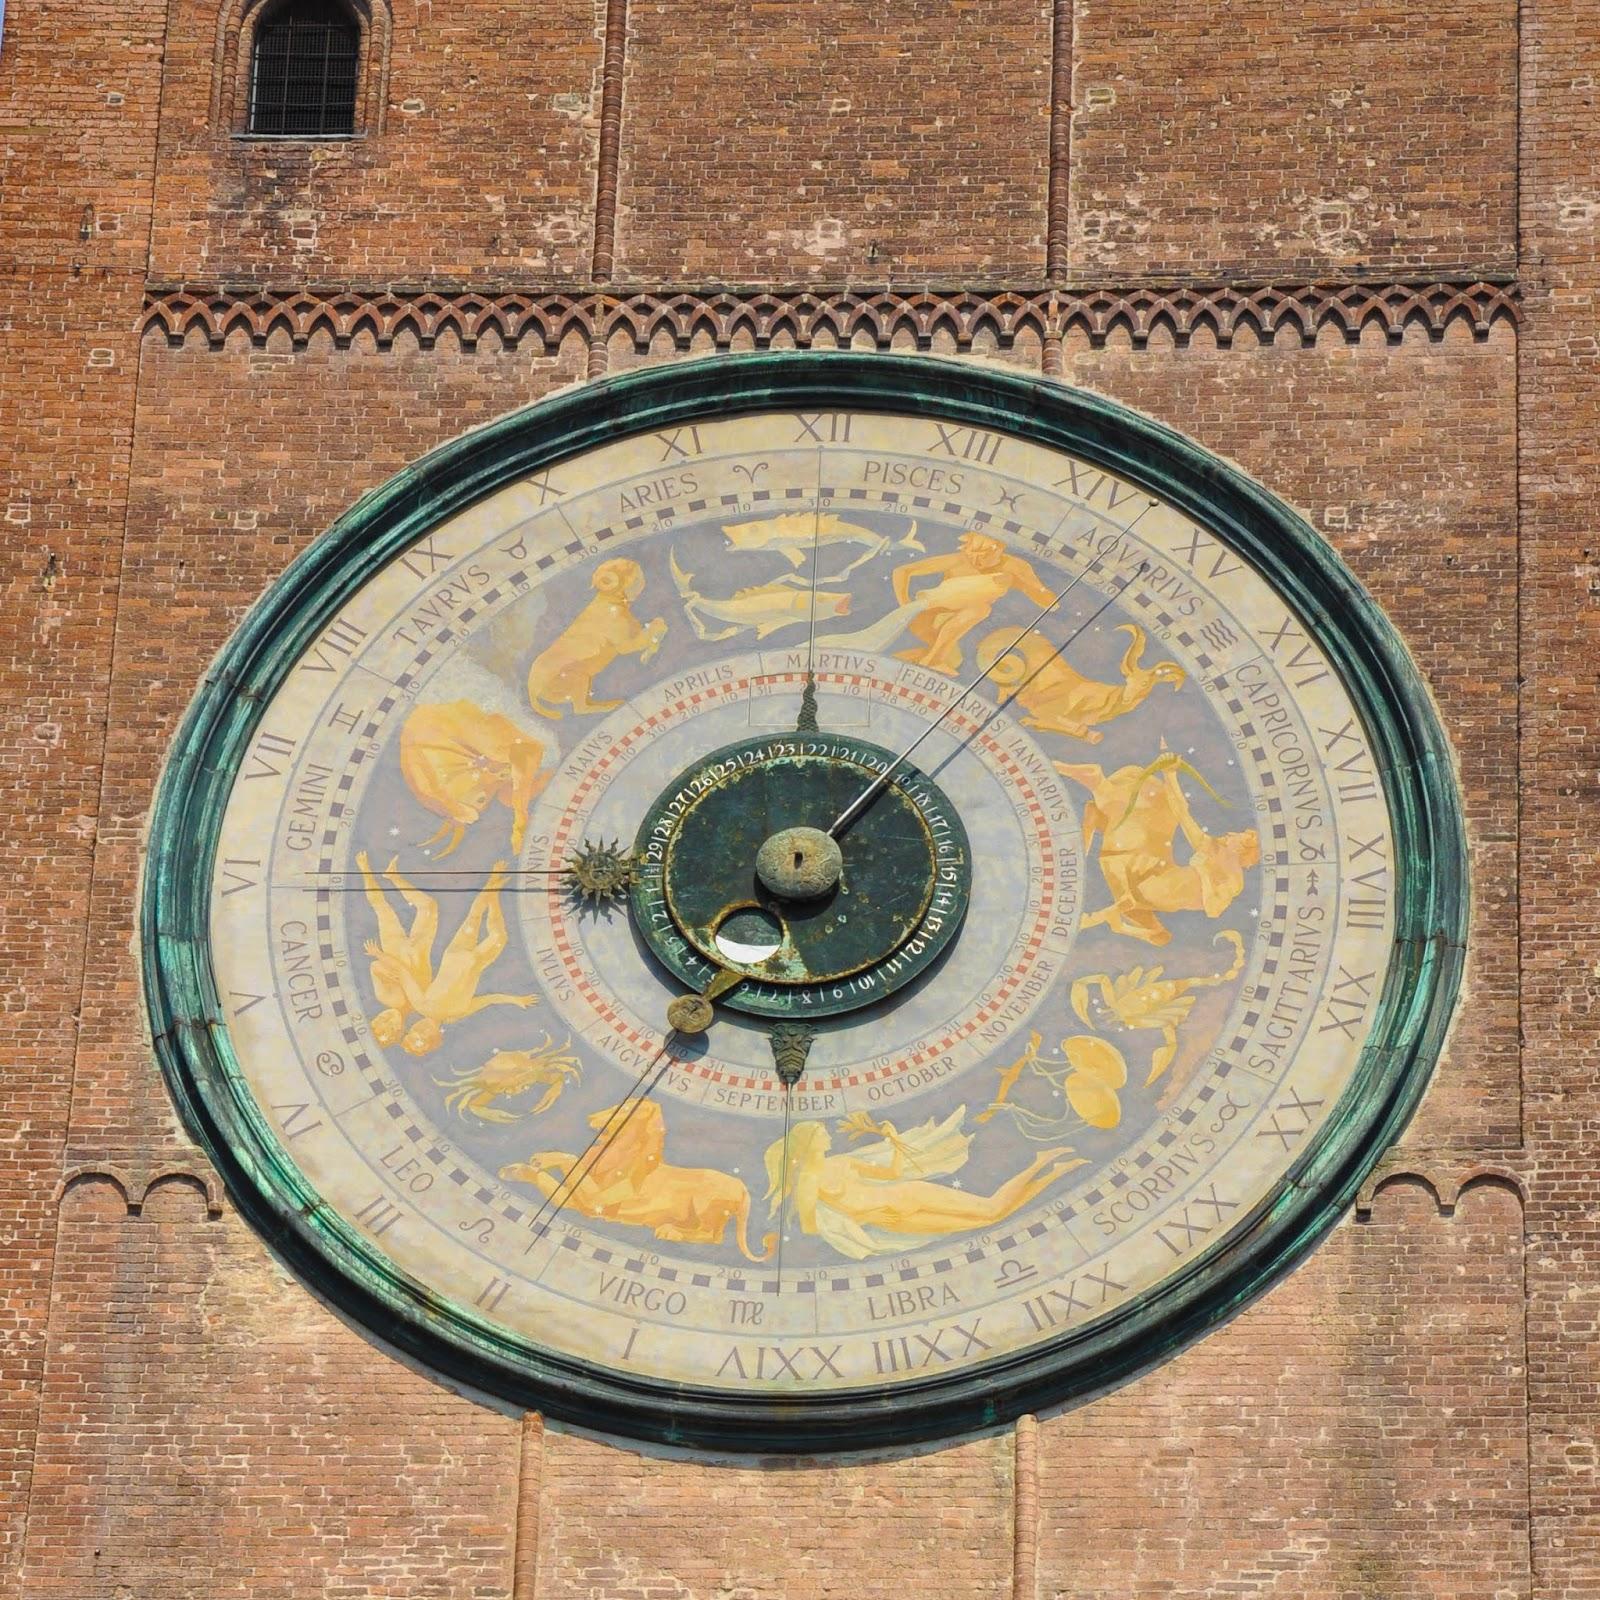 The astronomical clock, Campanile, Duomo, Cremona, Italy